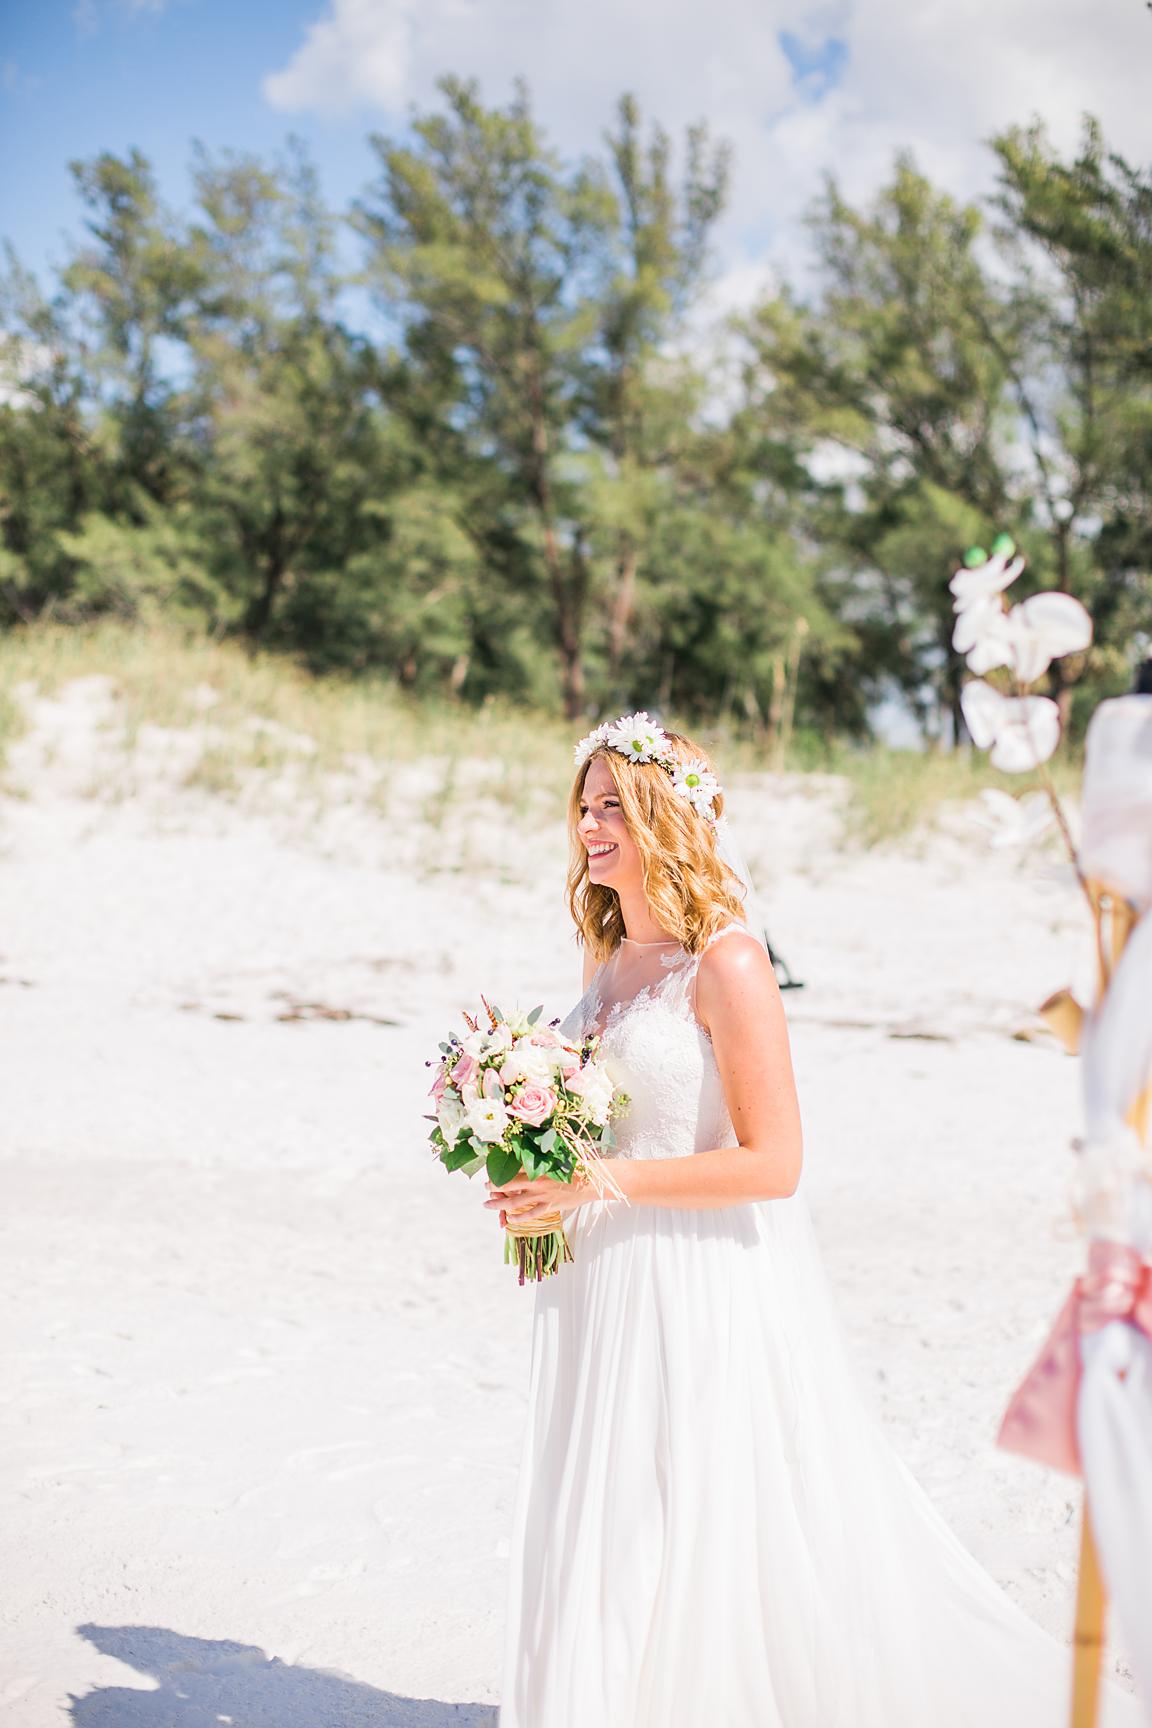 Luise + Daniel - Anna Maria Island Wedding Photography - Emily & Co 4.jpg